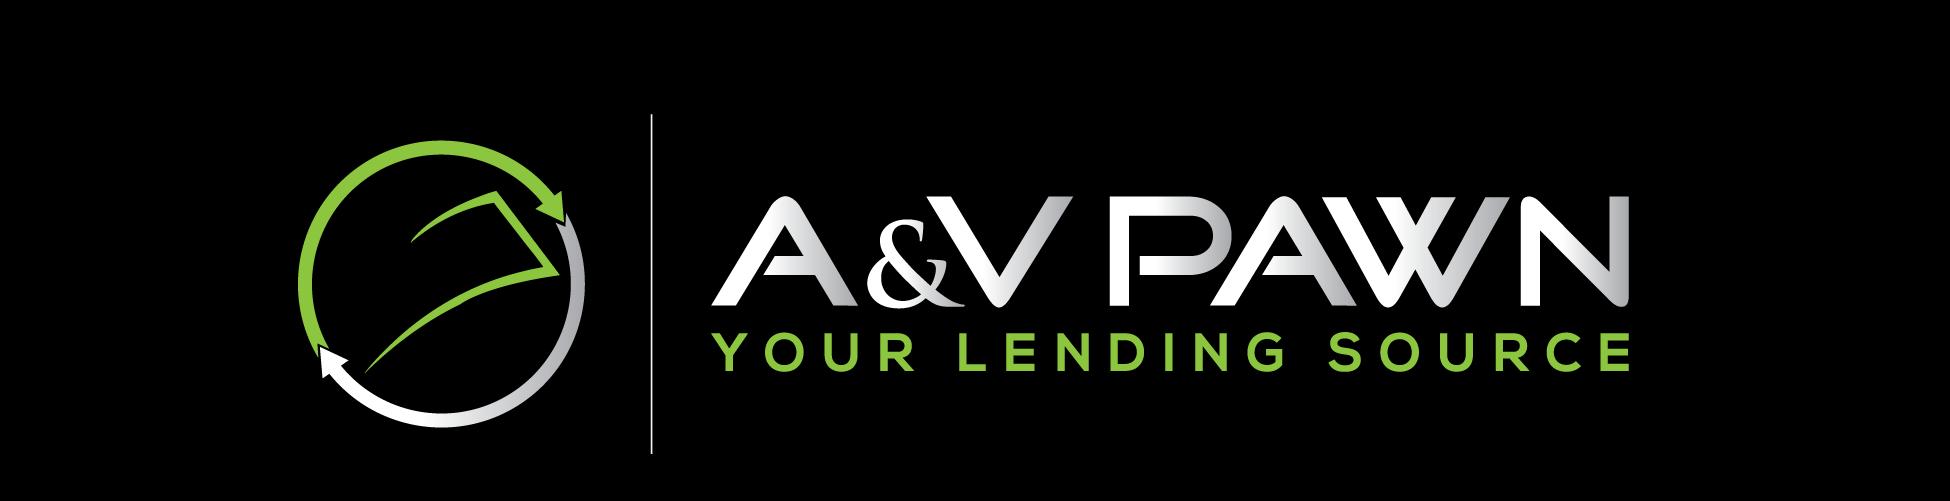 A&V Pawn Shop